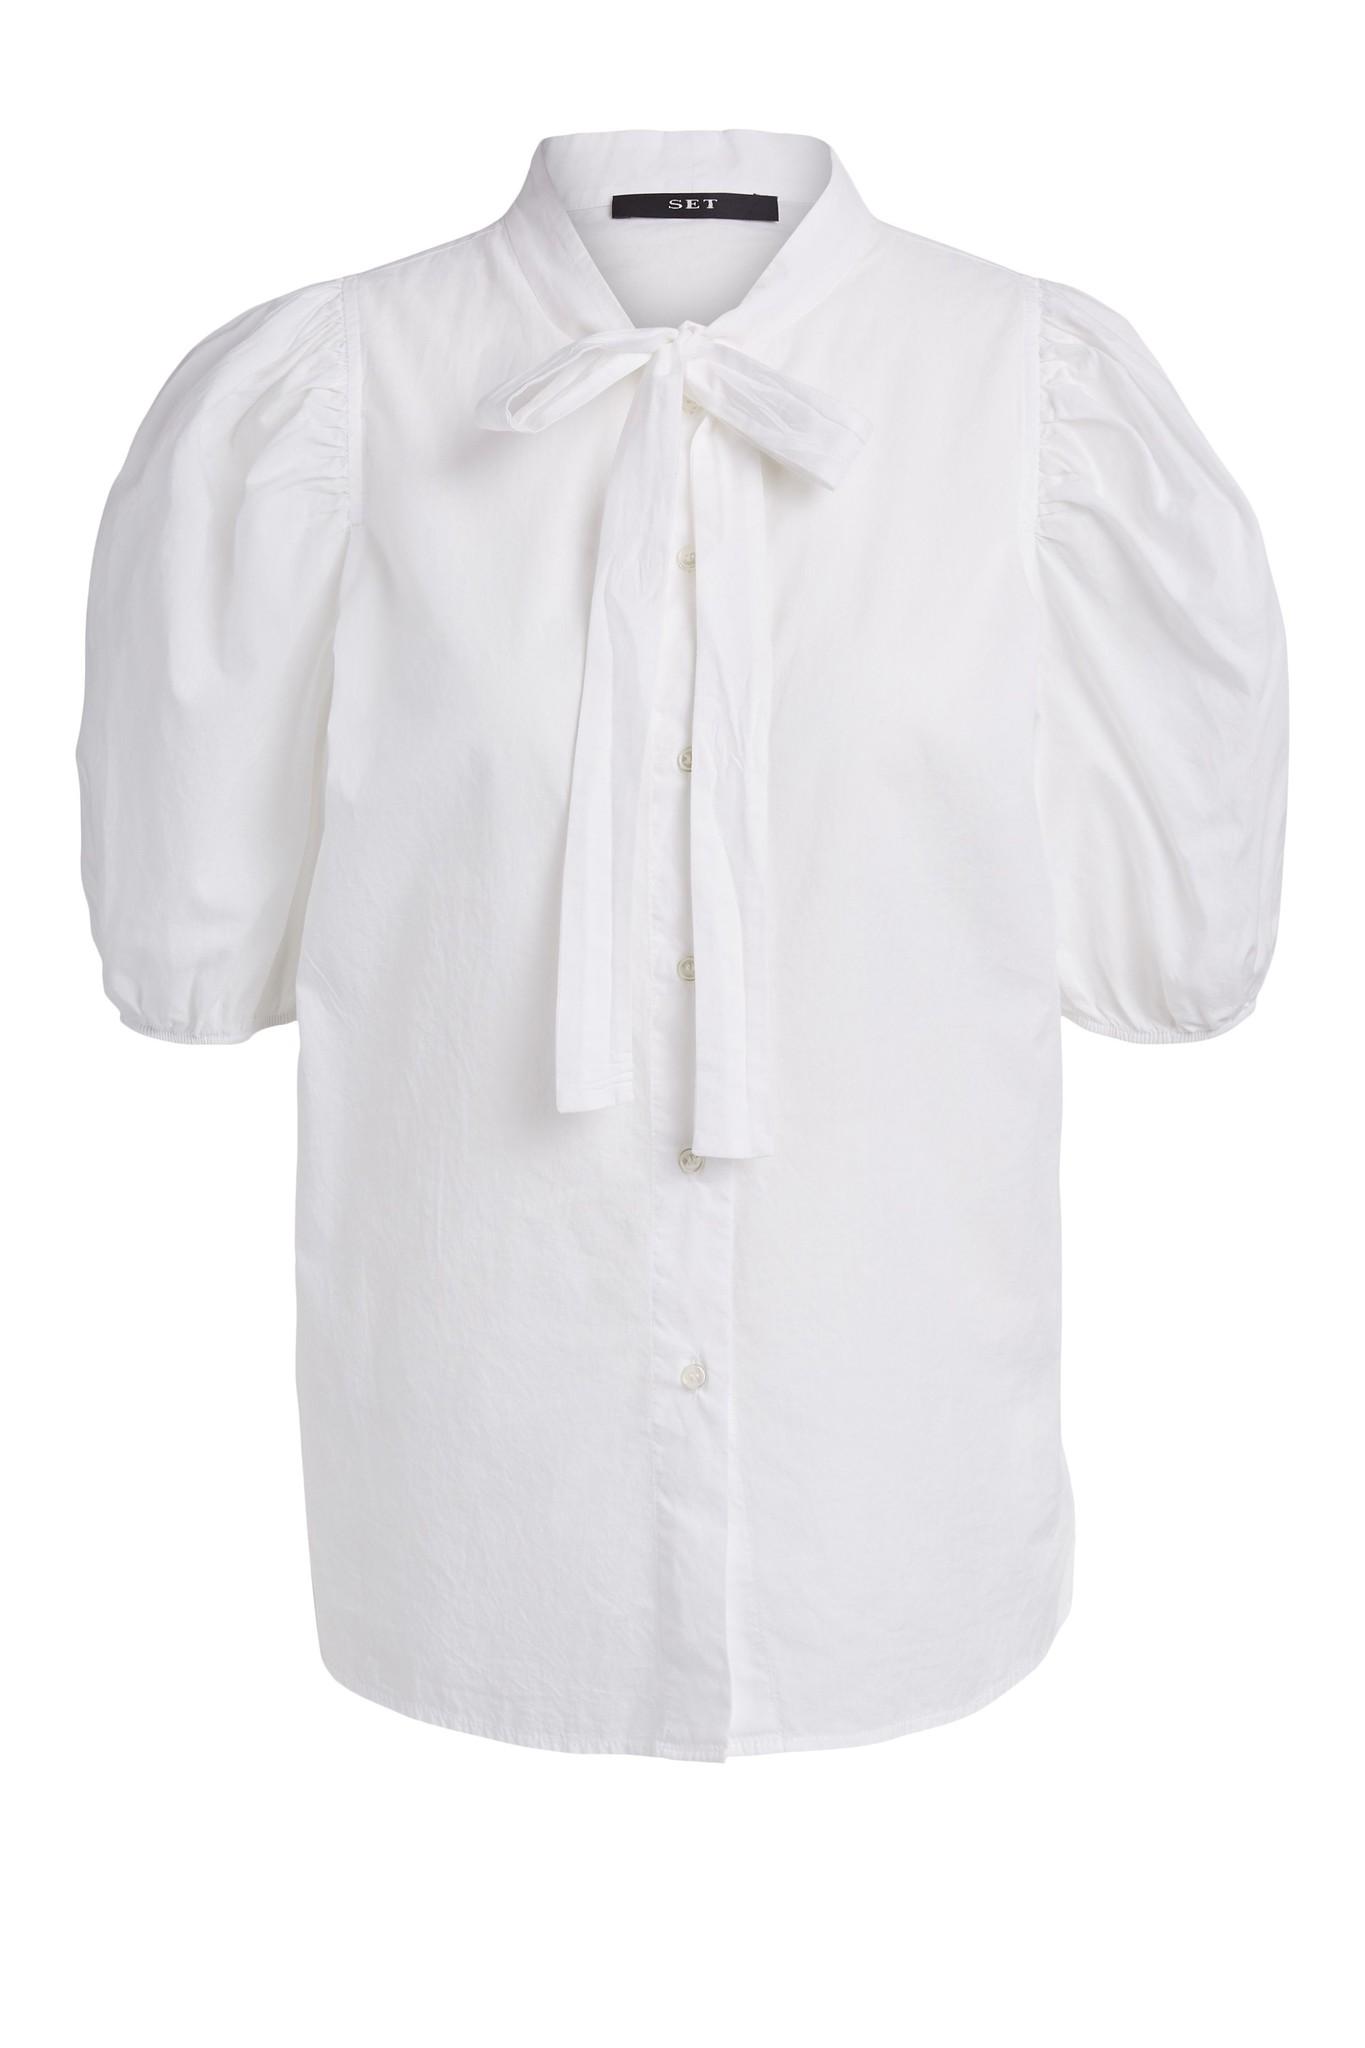 SET blouse 73629 1030-1